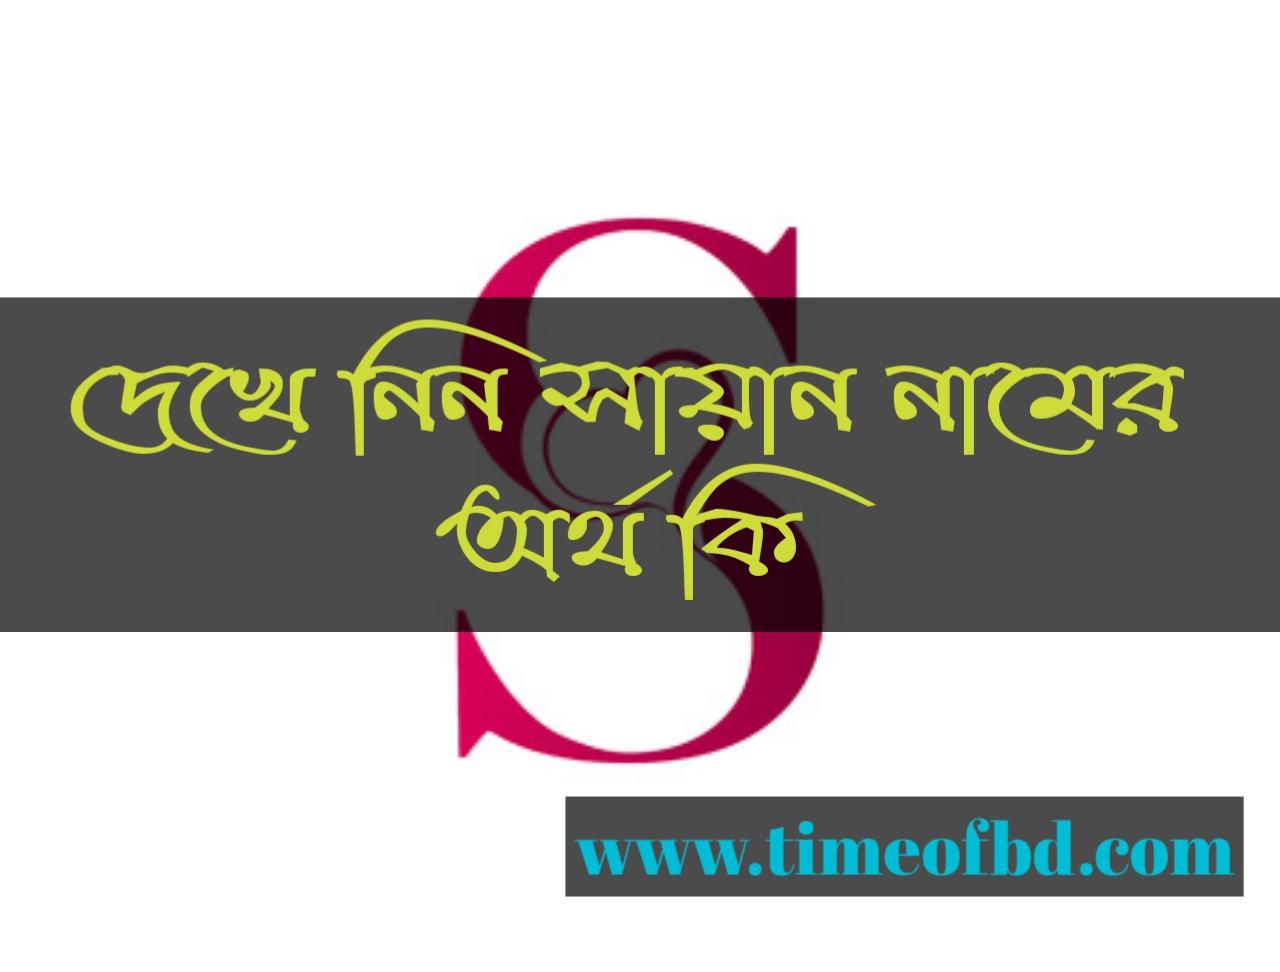 Sayan name meaning in Bengali, সায়ান নামের অর্থ কি, সায়ান নামের বাংলা অর্থ কি, সায়ান নামের ইসলামিক অর্থ কি,